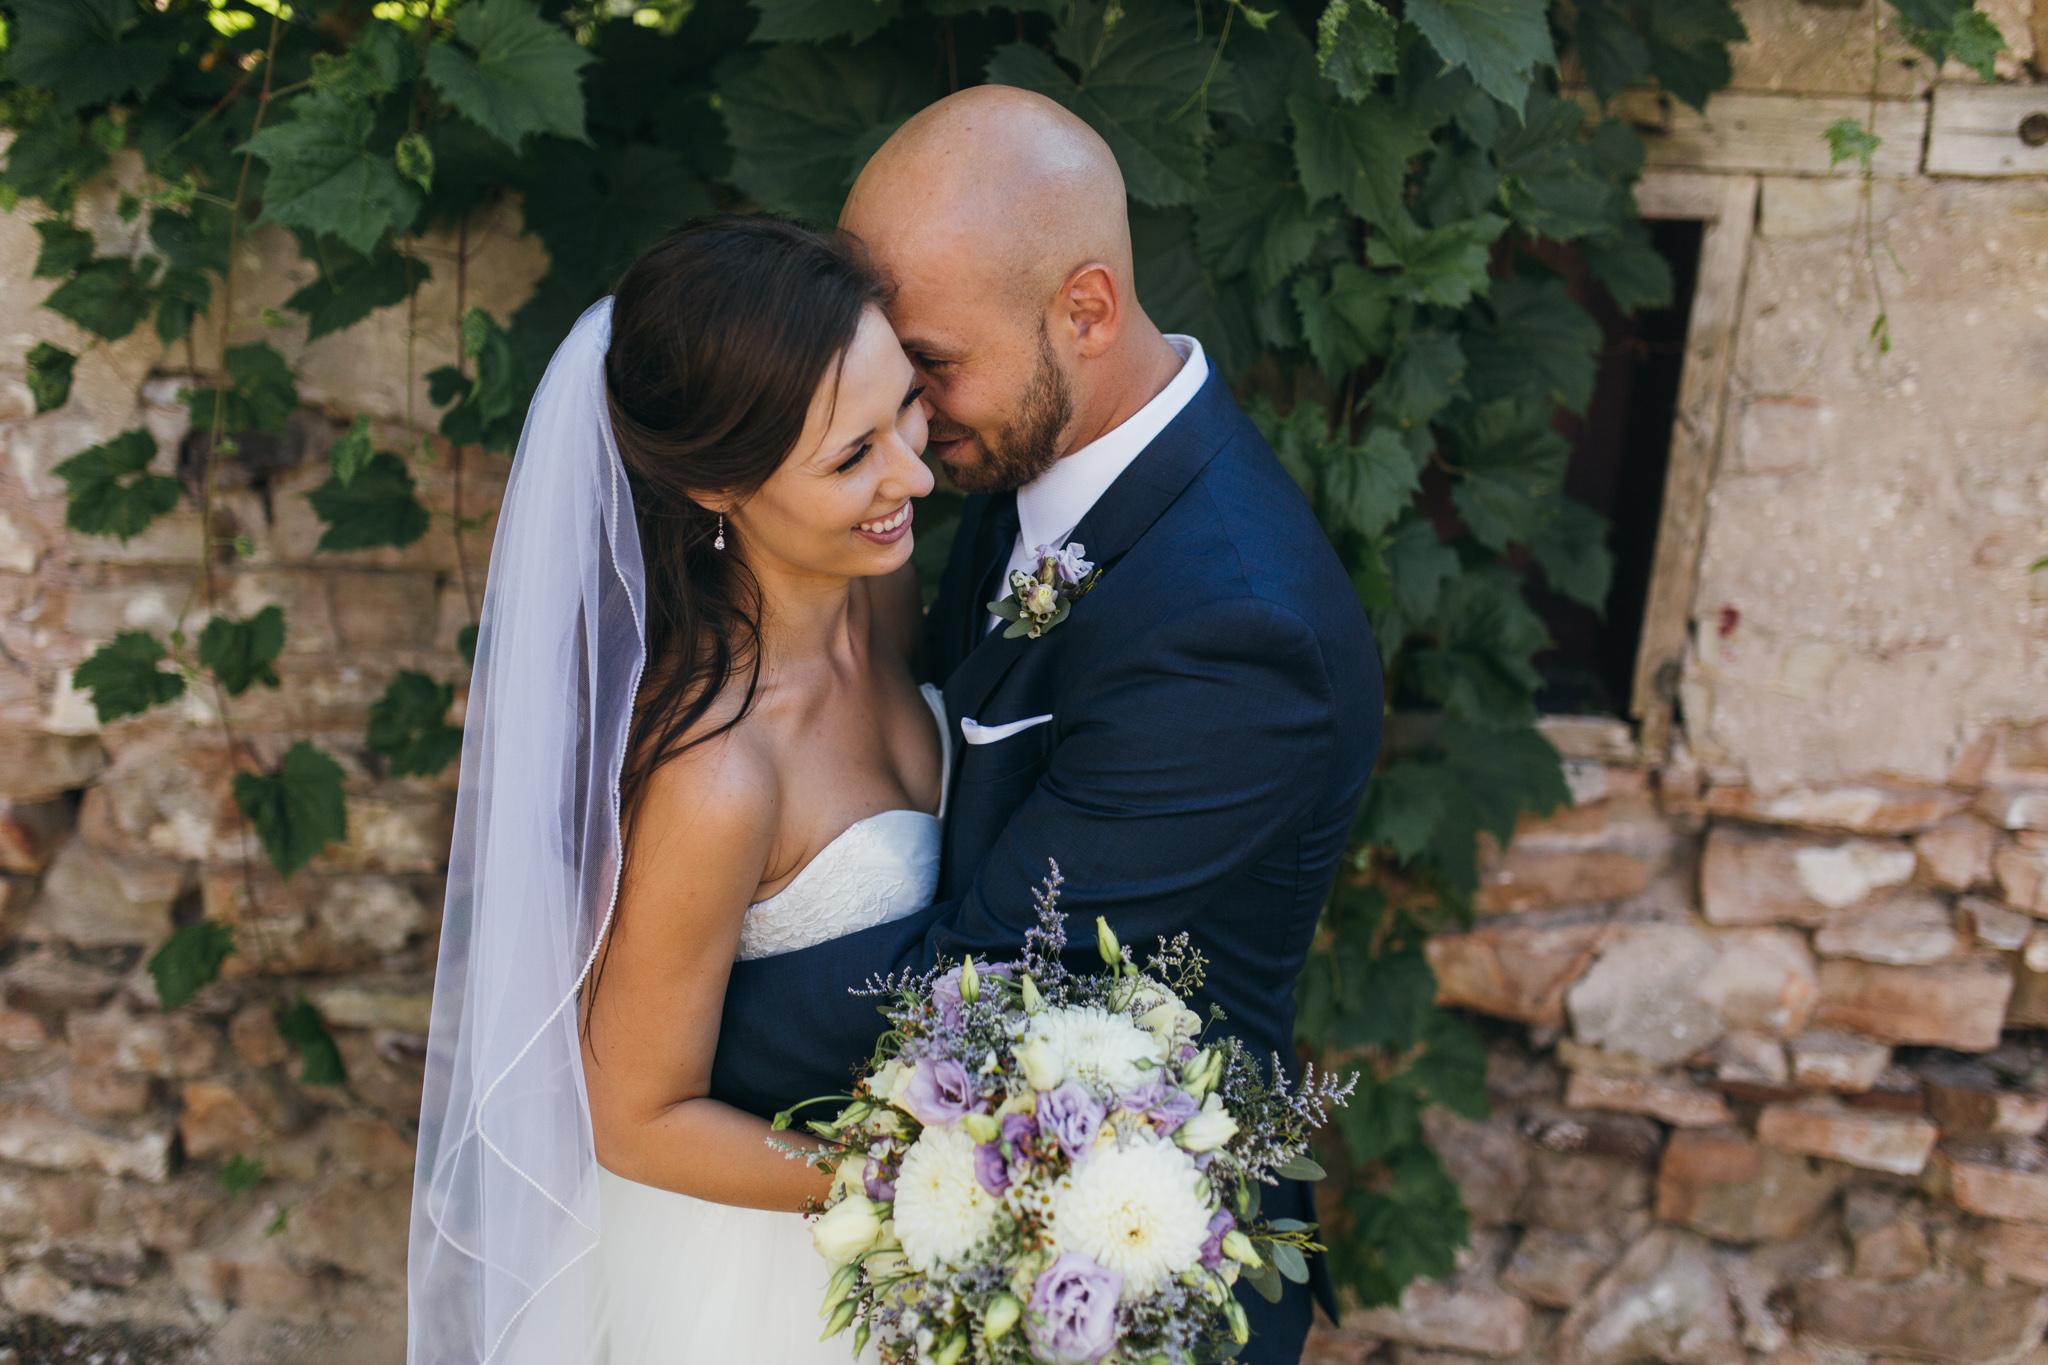 springer-house-burlington-wedding-photographer-425-of-756.jpg